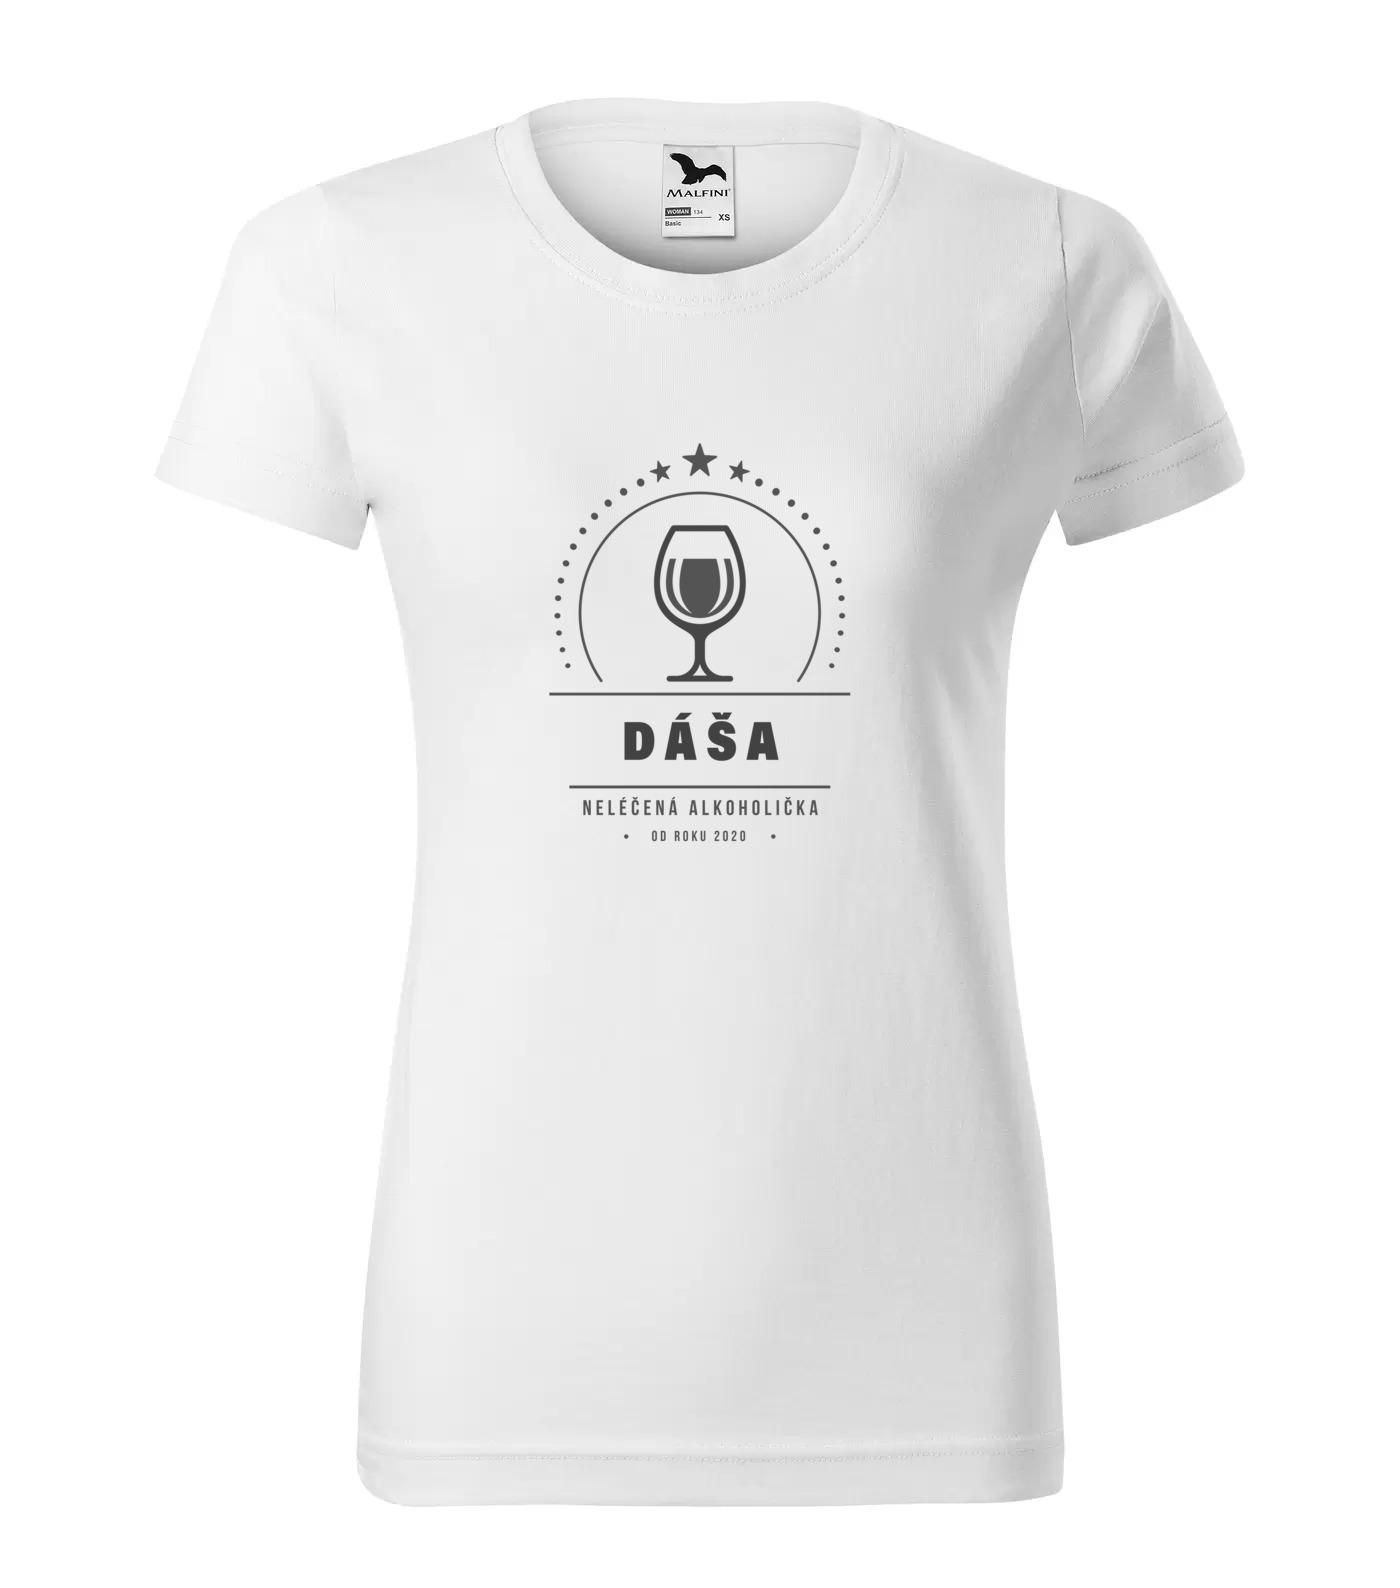 Tričko Alkoholička Dáša